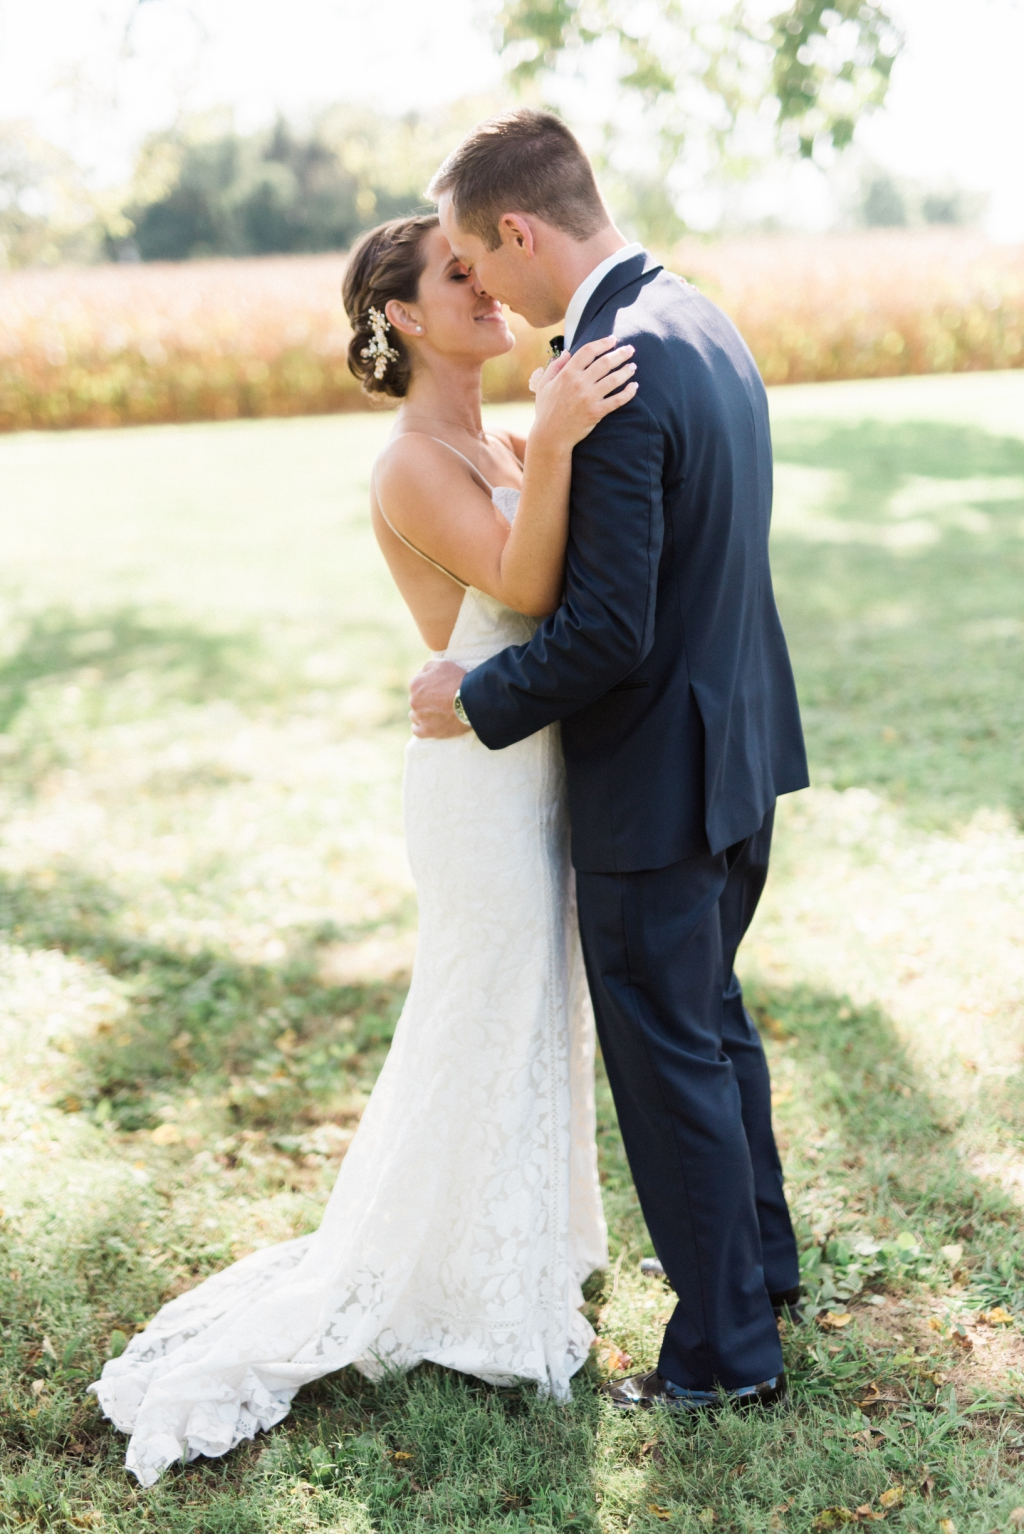 haley-richter-photography-buena-vista-confrence-center-wedding-summer-076